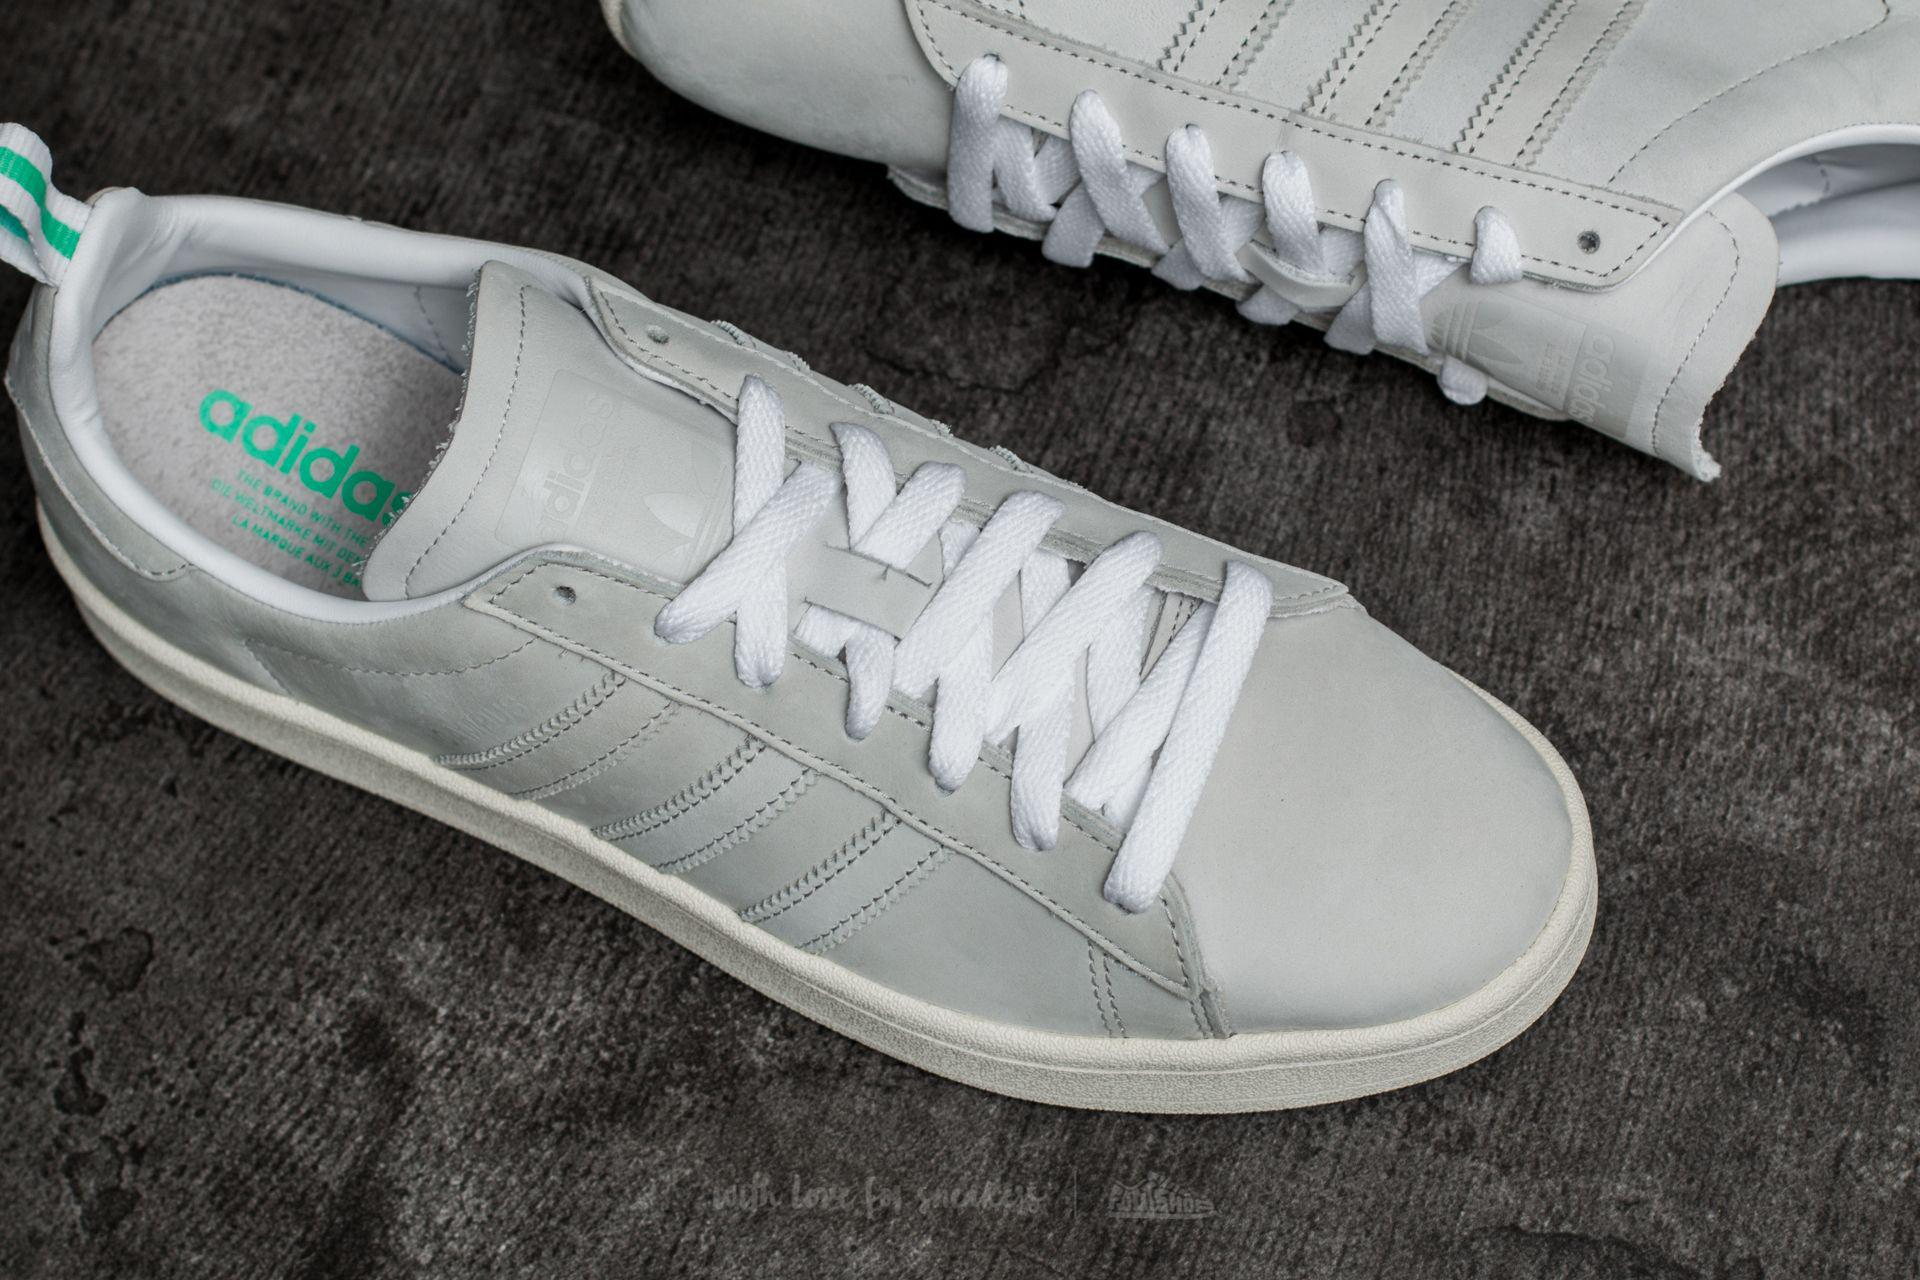 4dde38e81bbafc Lyst - adidas Originals Adidas Campus Ftw White  Vintage White ...